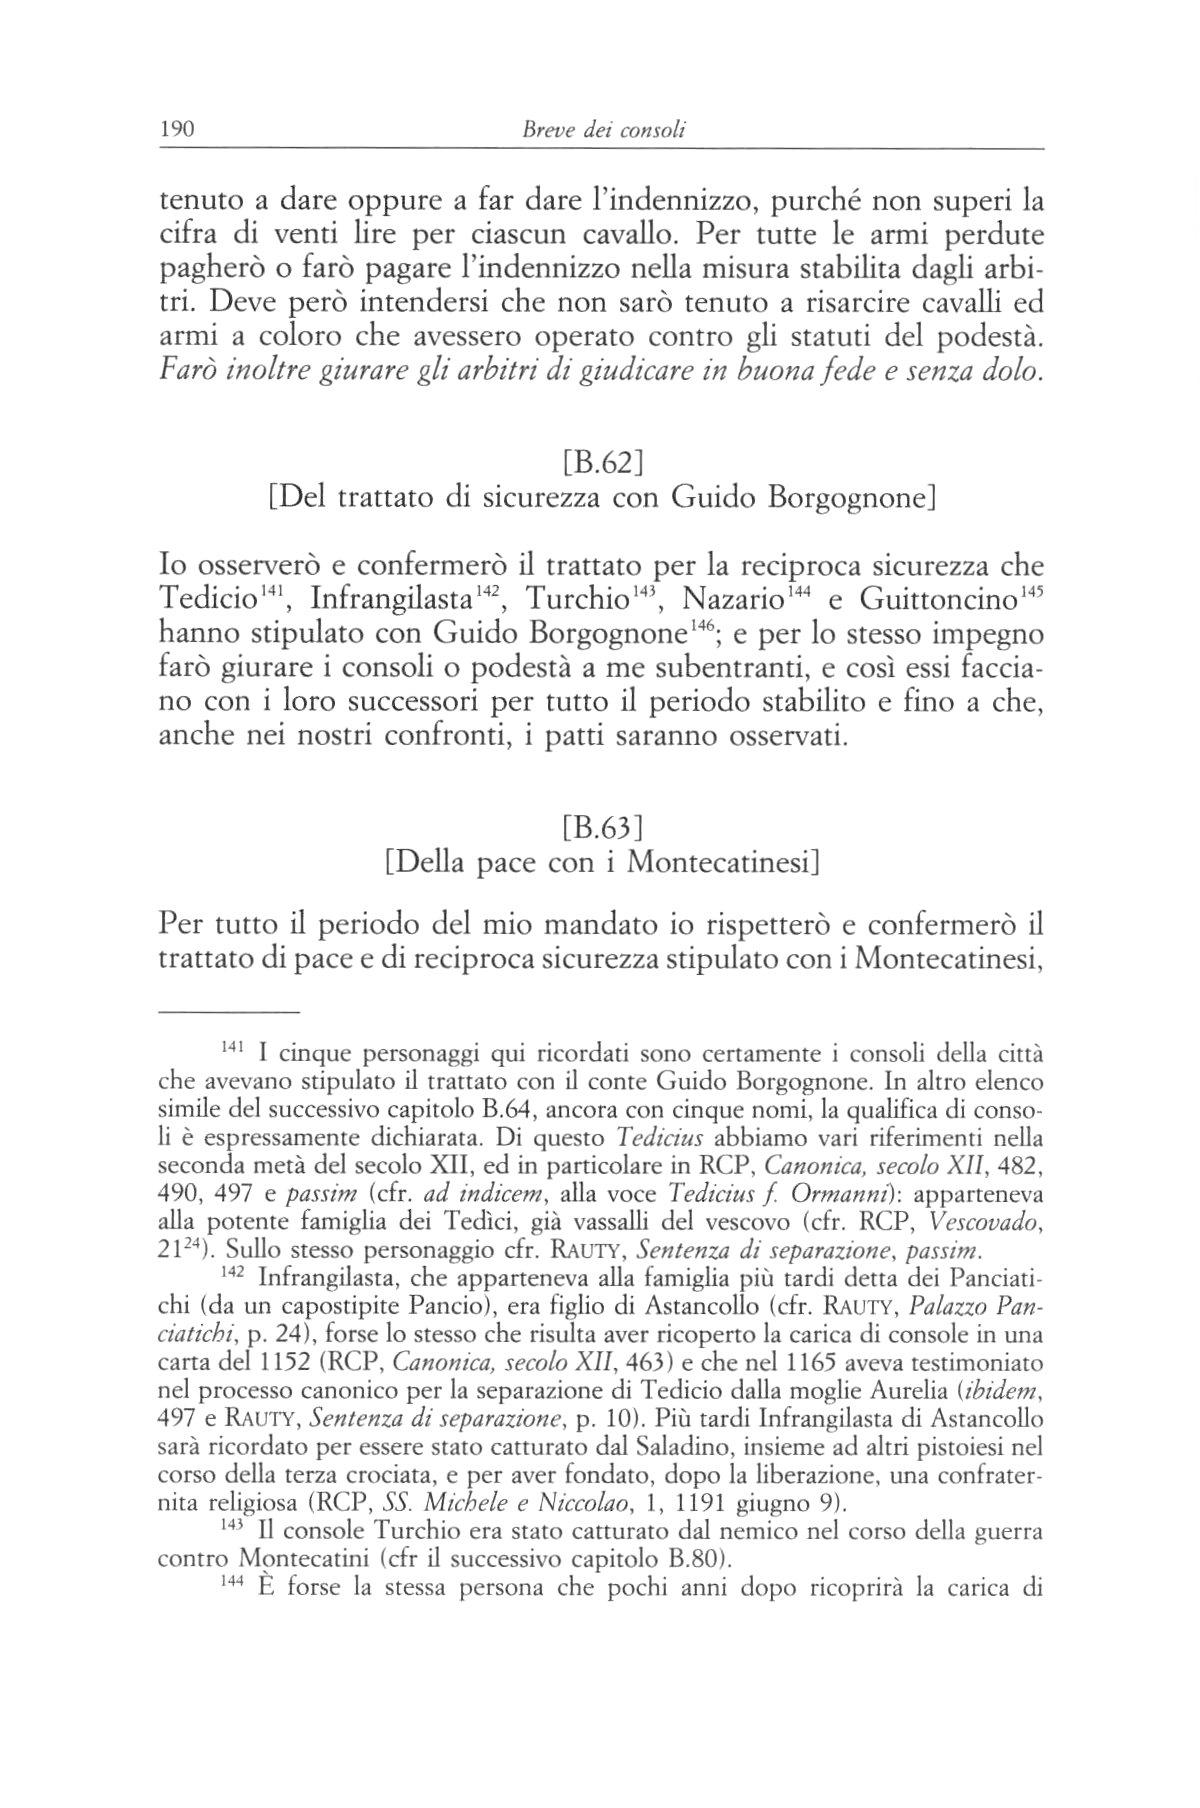 statuti pistoiesi del sec.XII 0190.jpg